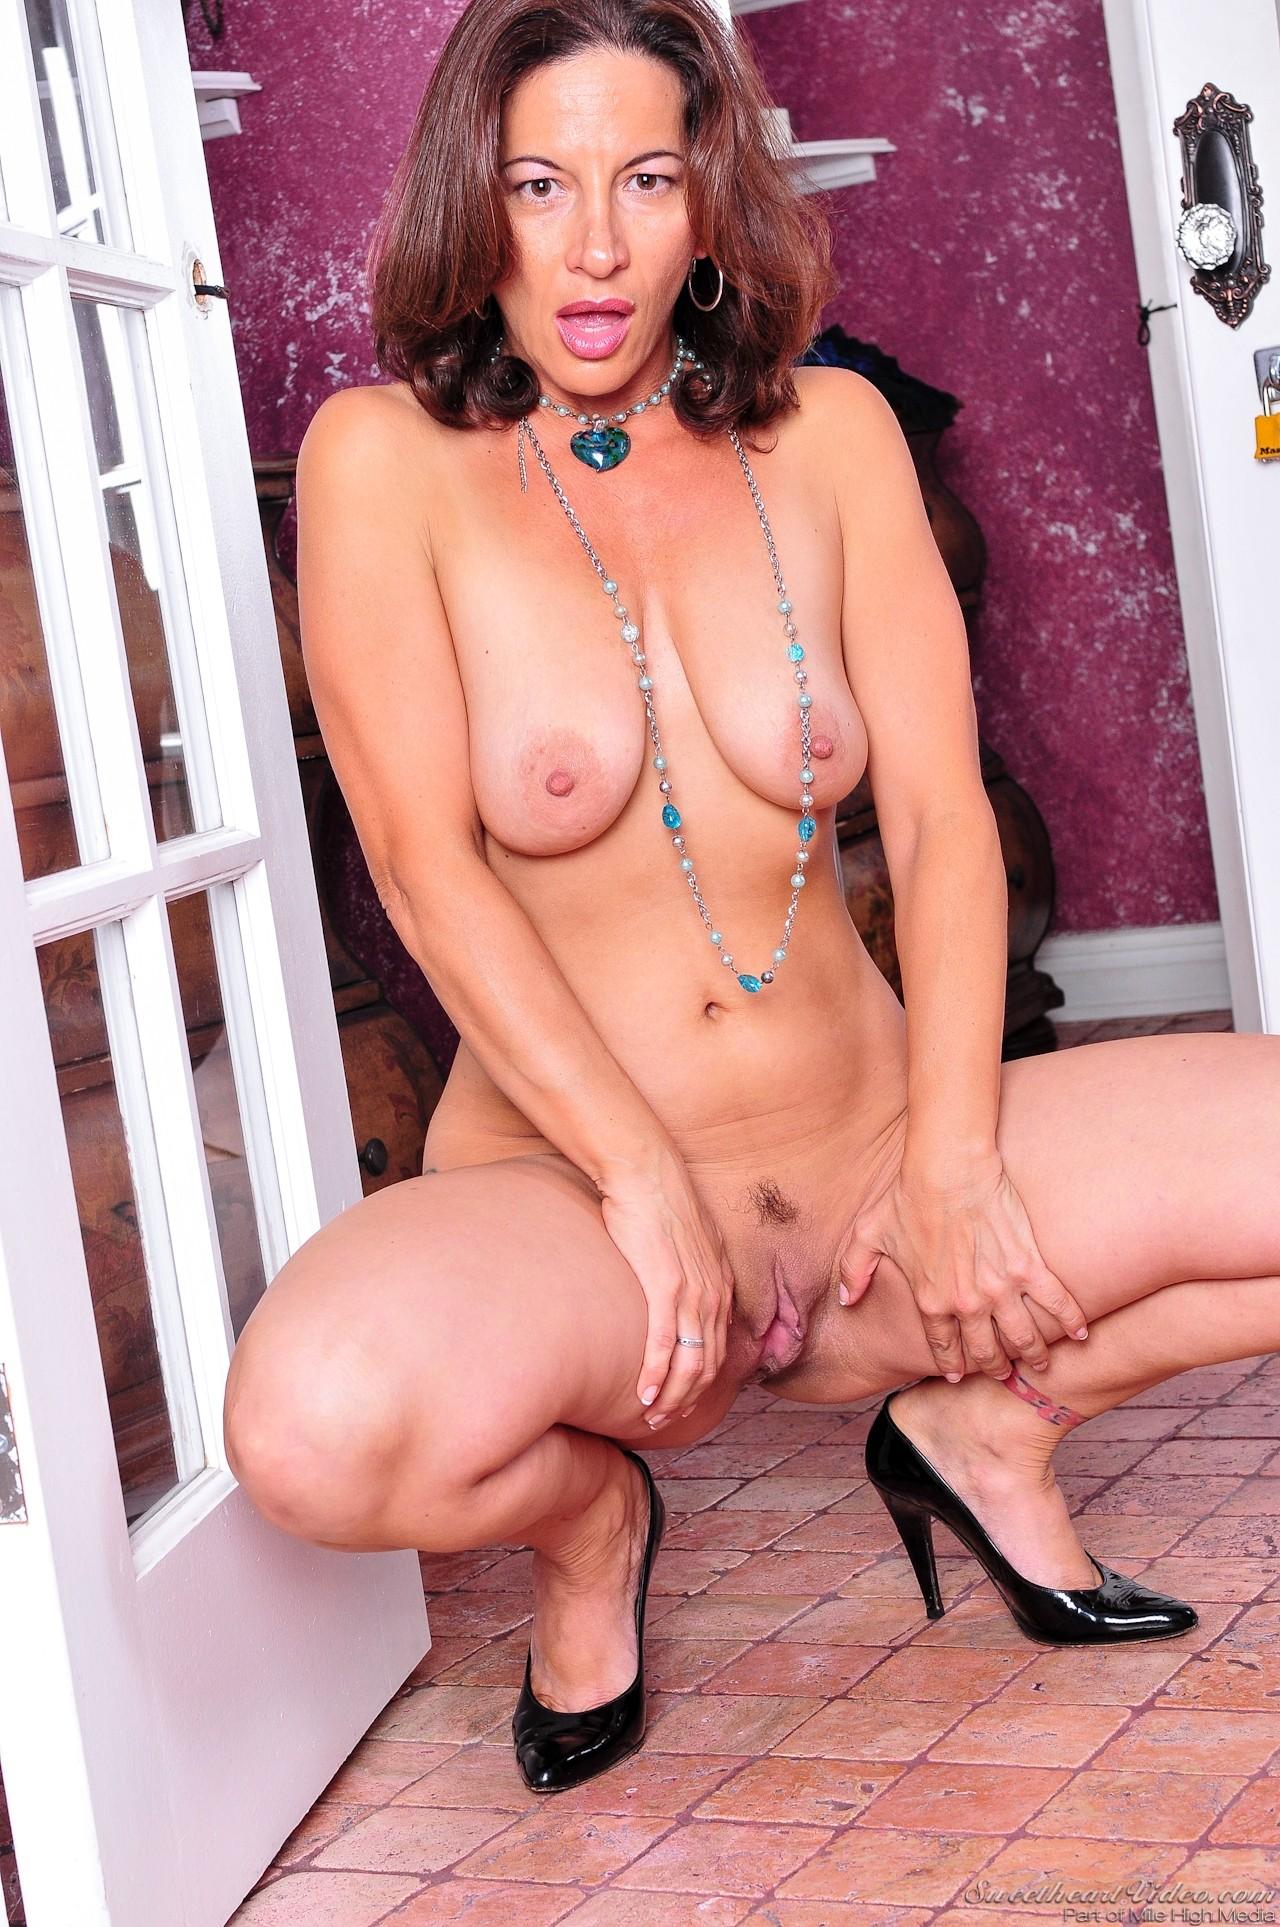 Melissa Monet, Elexis Monroe - Lesbian Babysitters 77358-7751